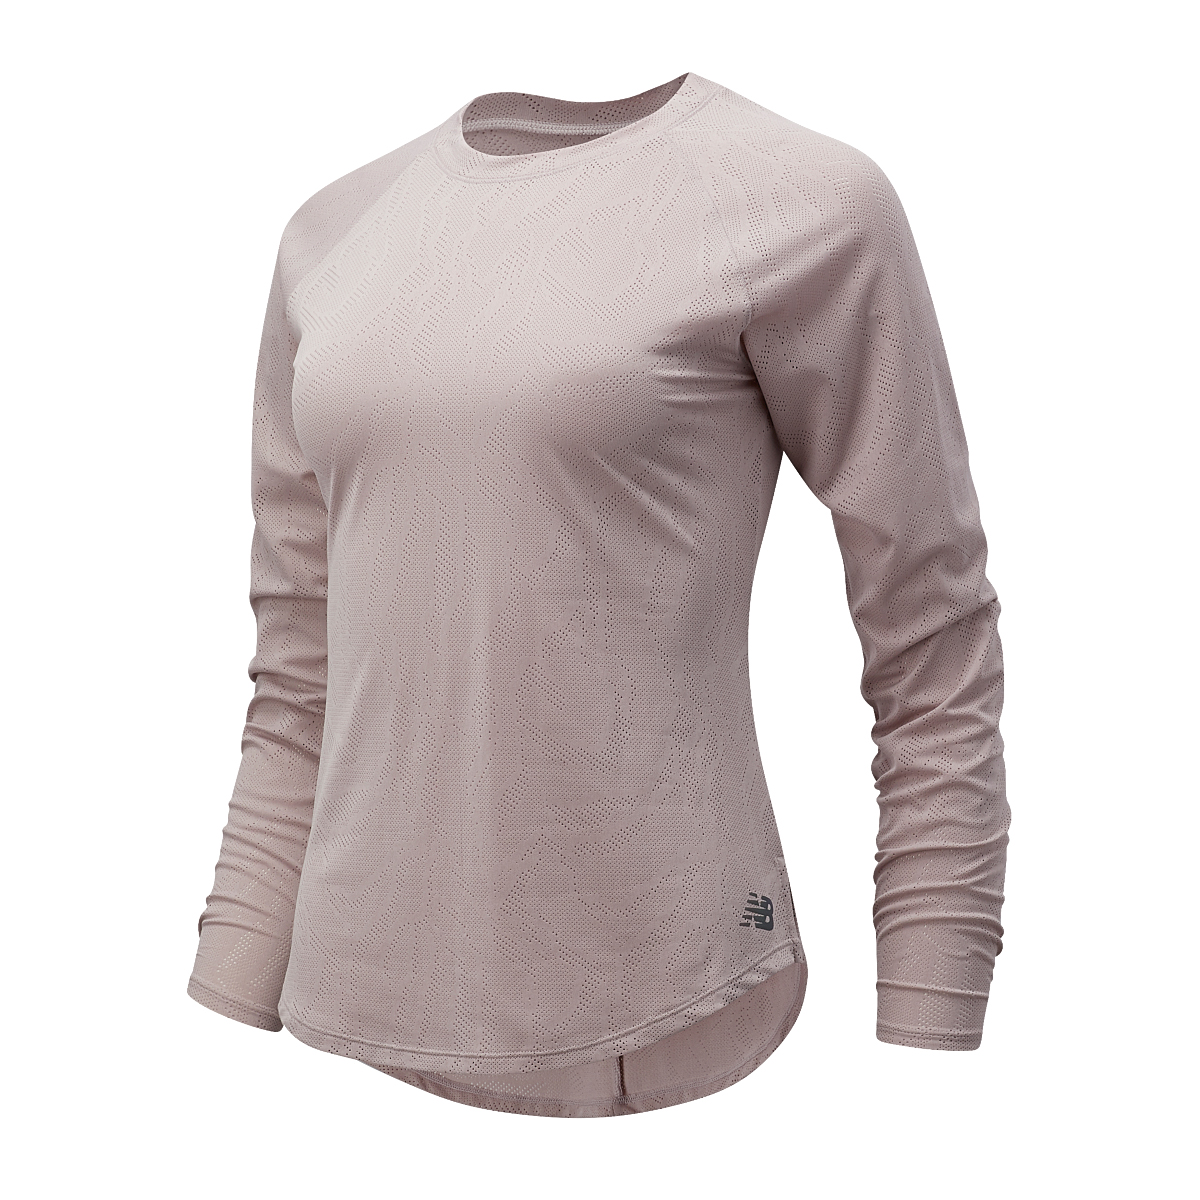 Women's New Balance Q Speed Jacquard Long Sleeve  - Color: Logwood - Size: XS, Logwood, large, image 1